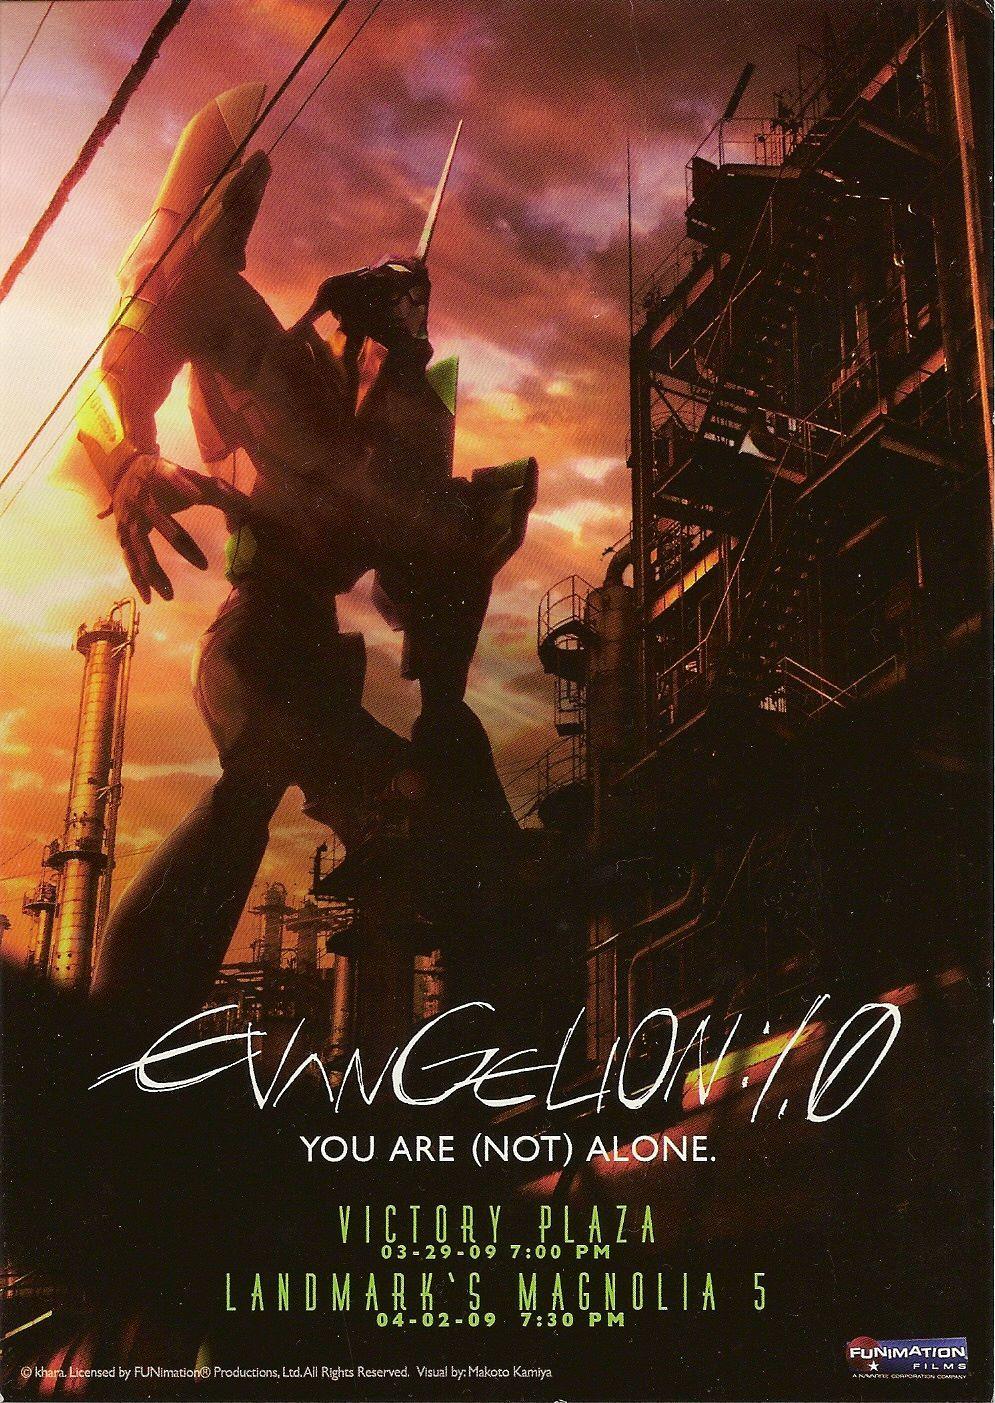 Evangelion: 1.0 You Are (not) Alone OVA+ DESCARGA Evacard